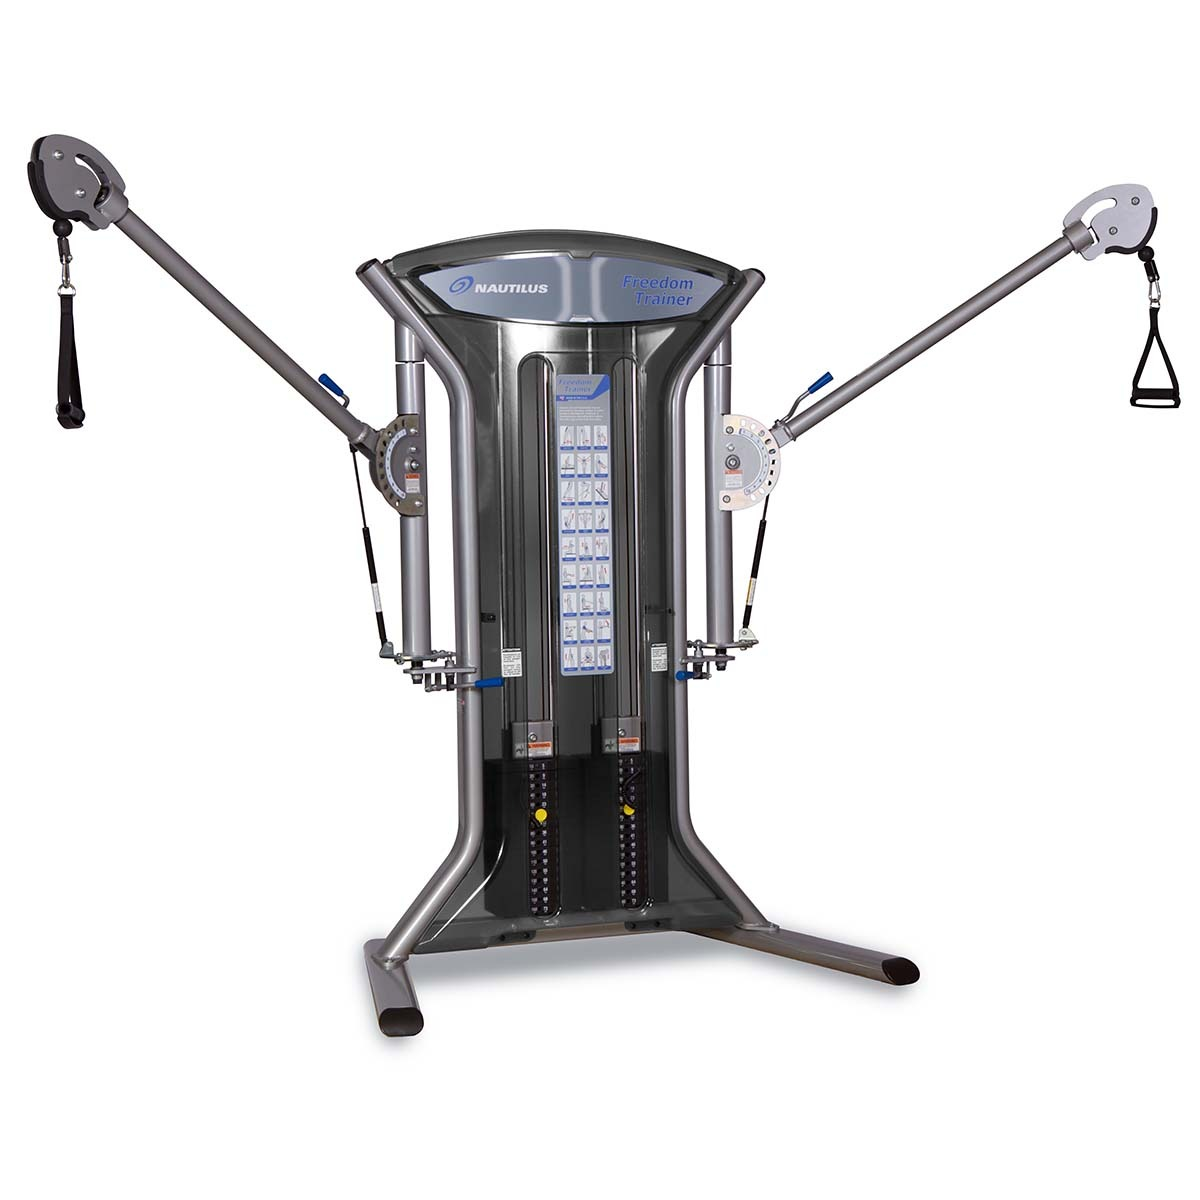 Vancouver Strength Equipment - Nautilus Freedom Trainer - Lifestyle Equipment